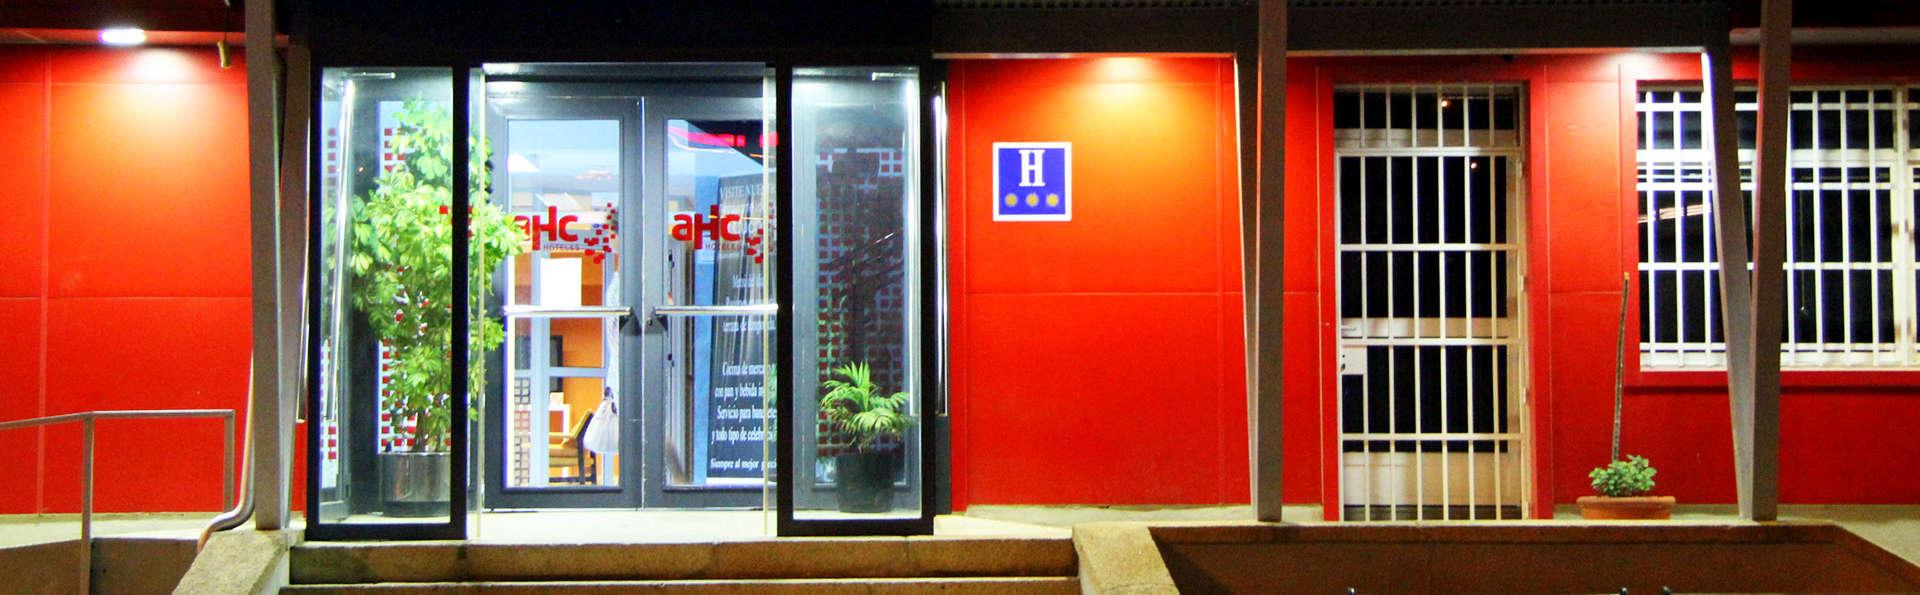 AHC Hoteles - EDIT_entry.jpg